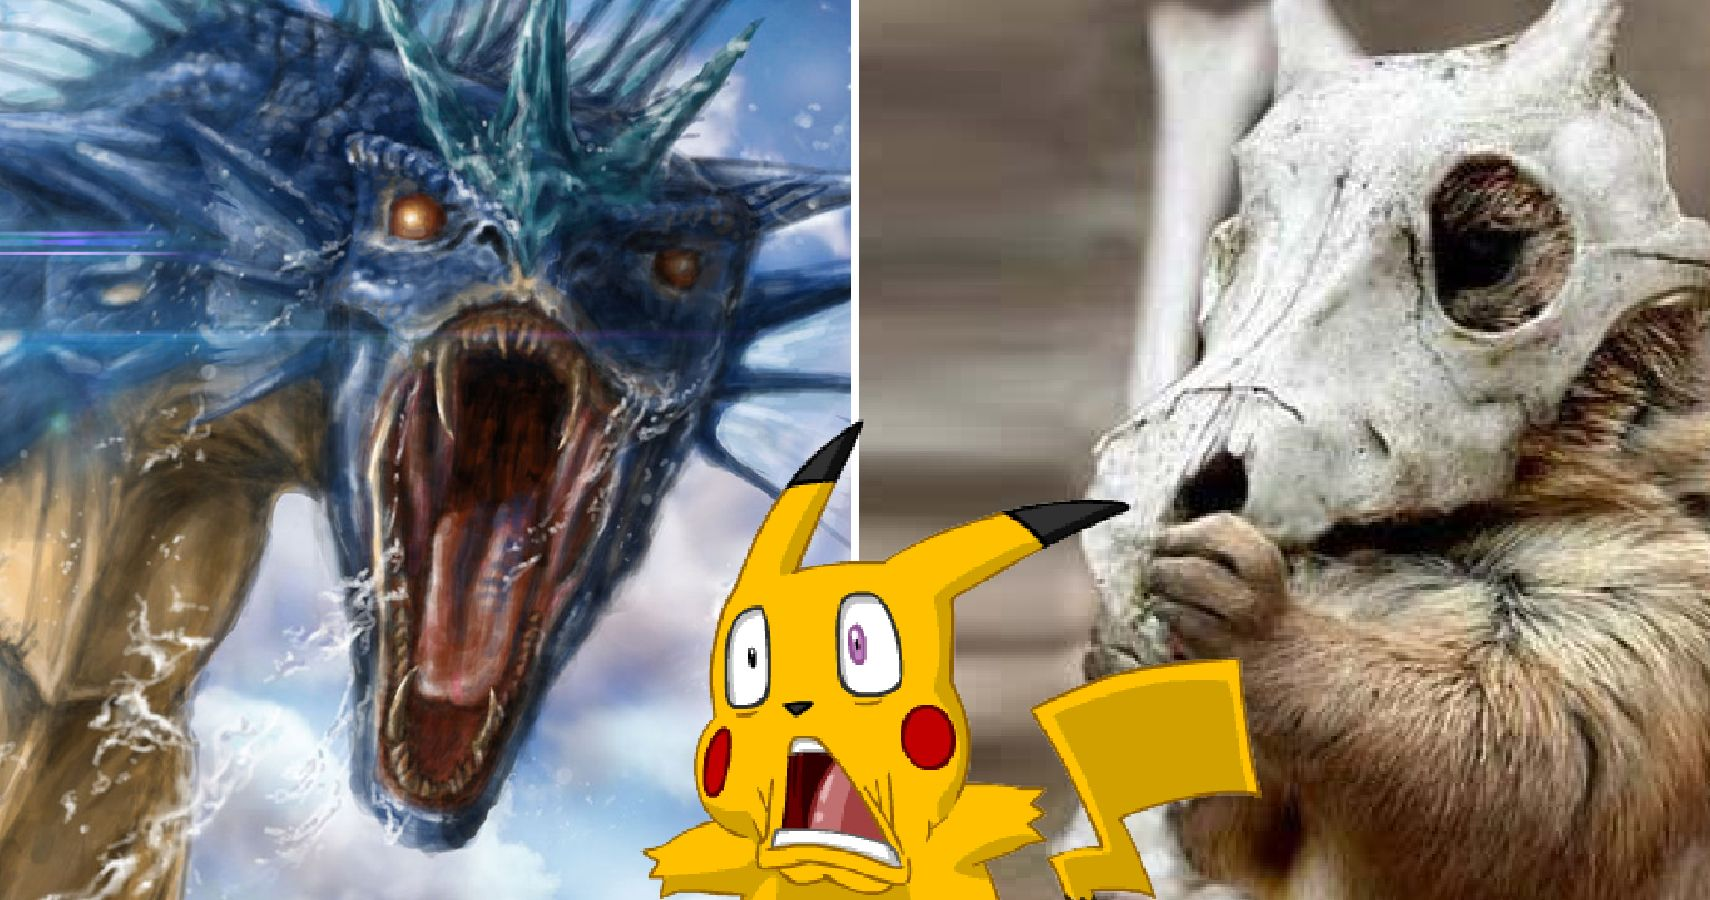 Violent Monsters Disturbingly Realistic Pokémon That Are Too Creepy